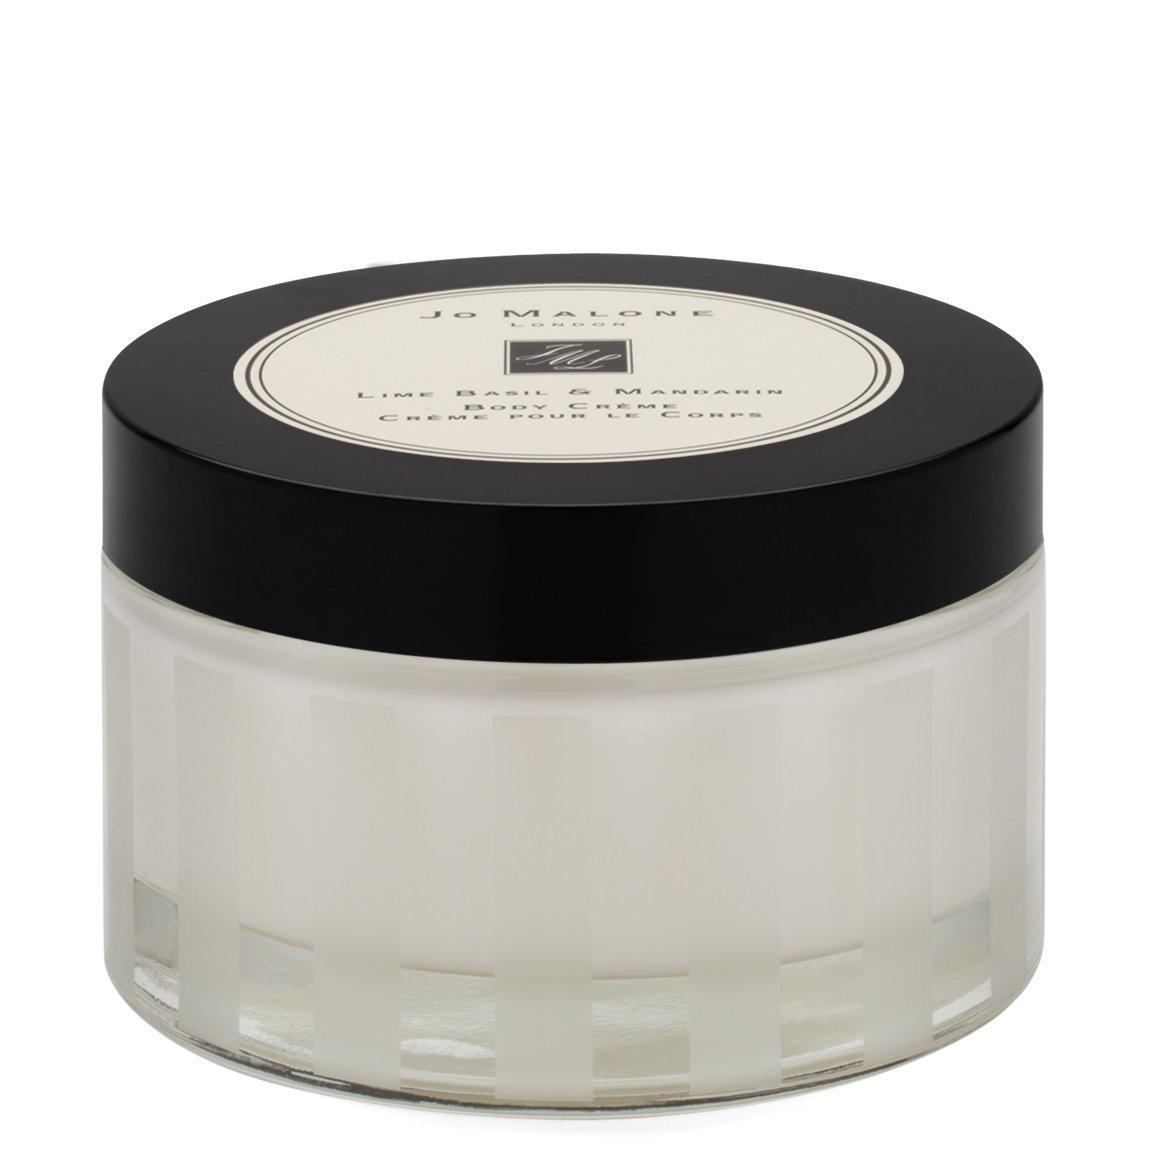 Jo Malone London Lime Basil & Mandarin Body Crème alternative view 1 - product swatch.